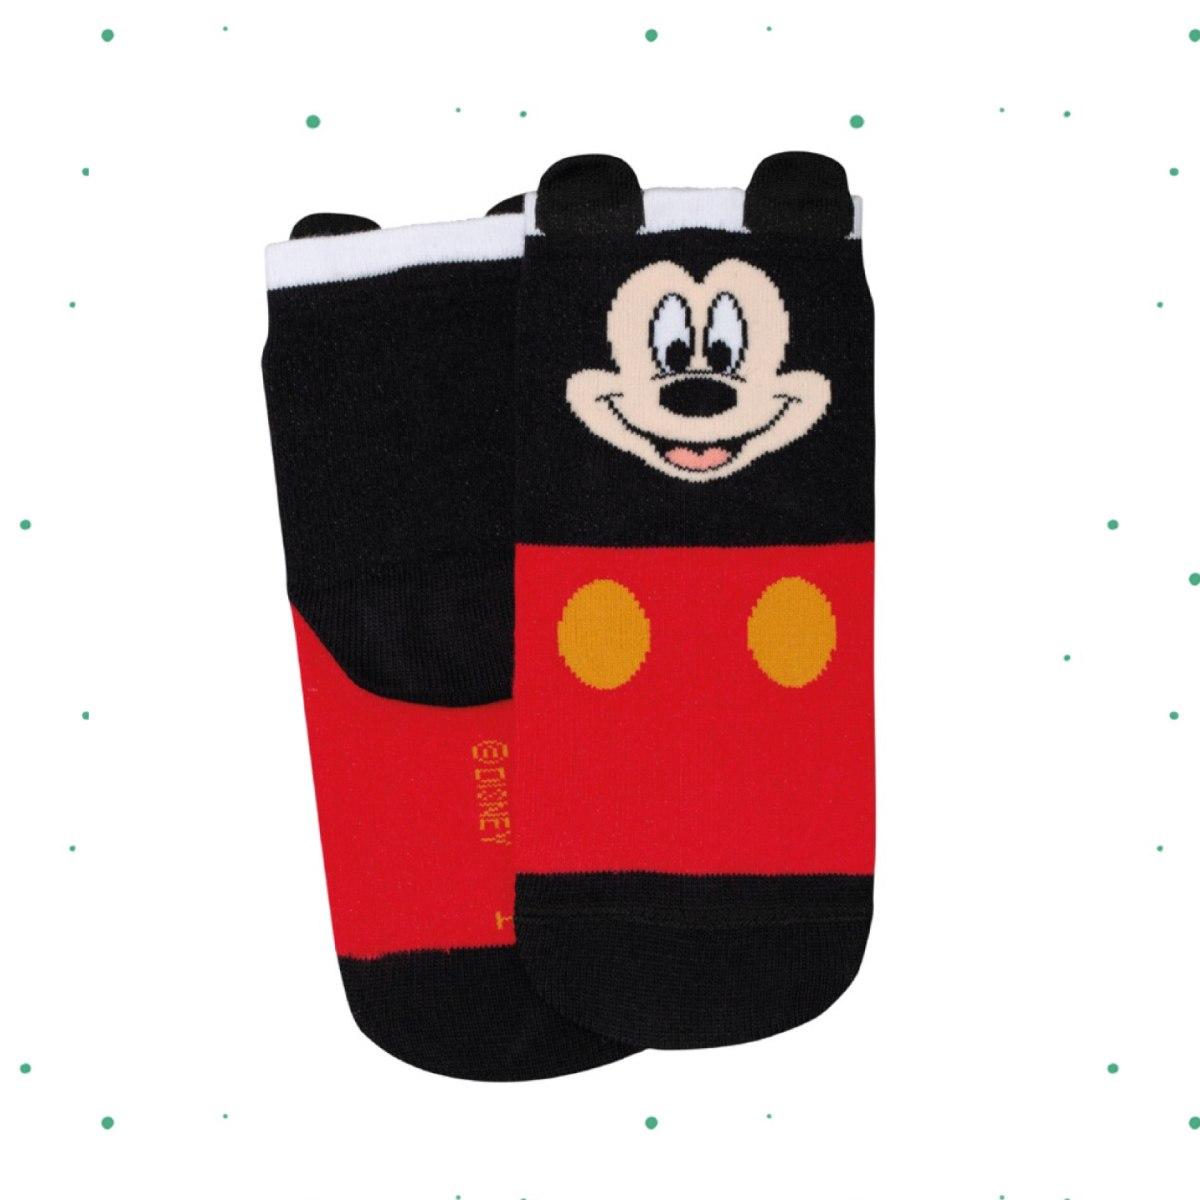 Meia Infantil Lupo Disney Estampa Mickey